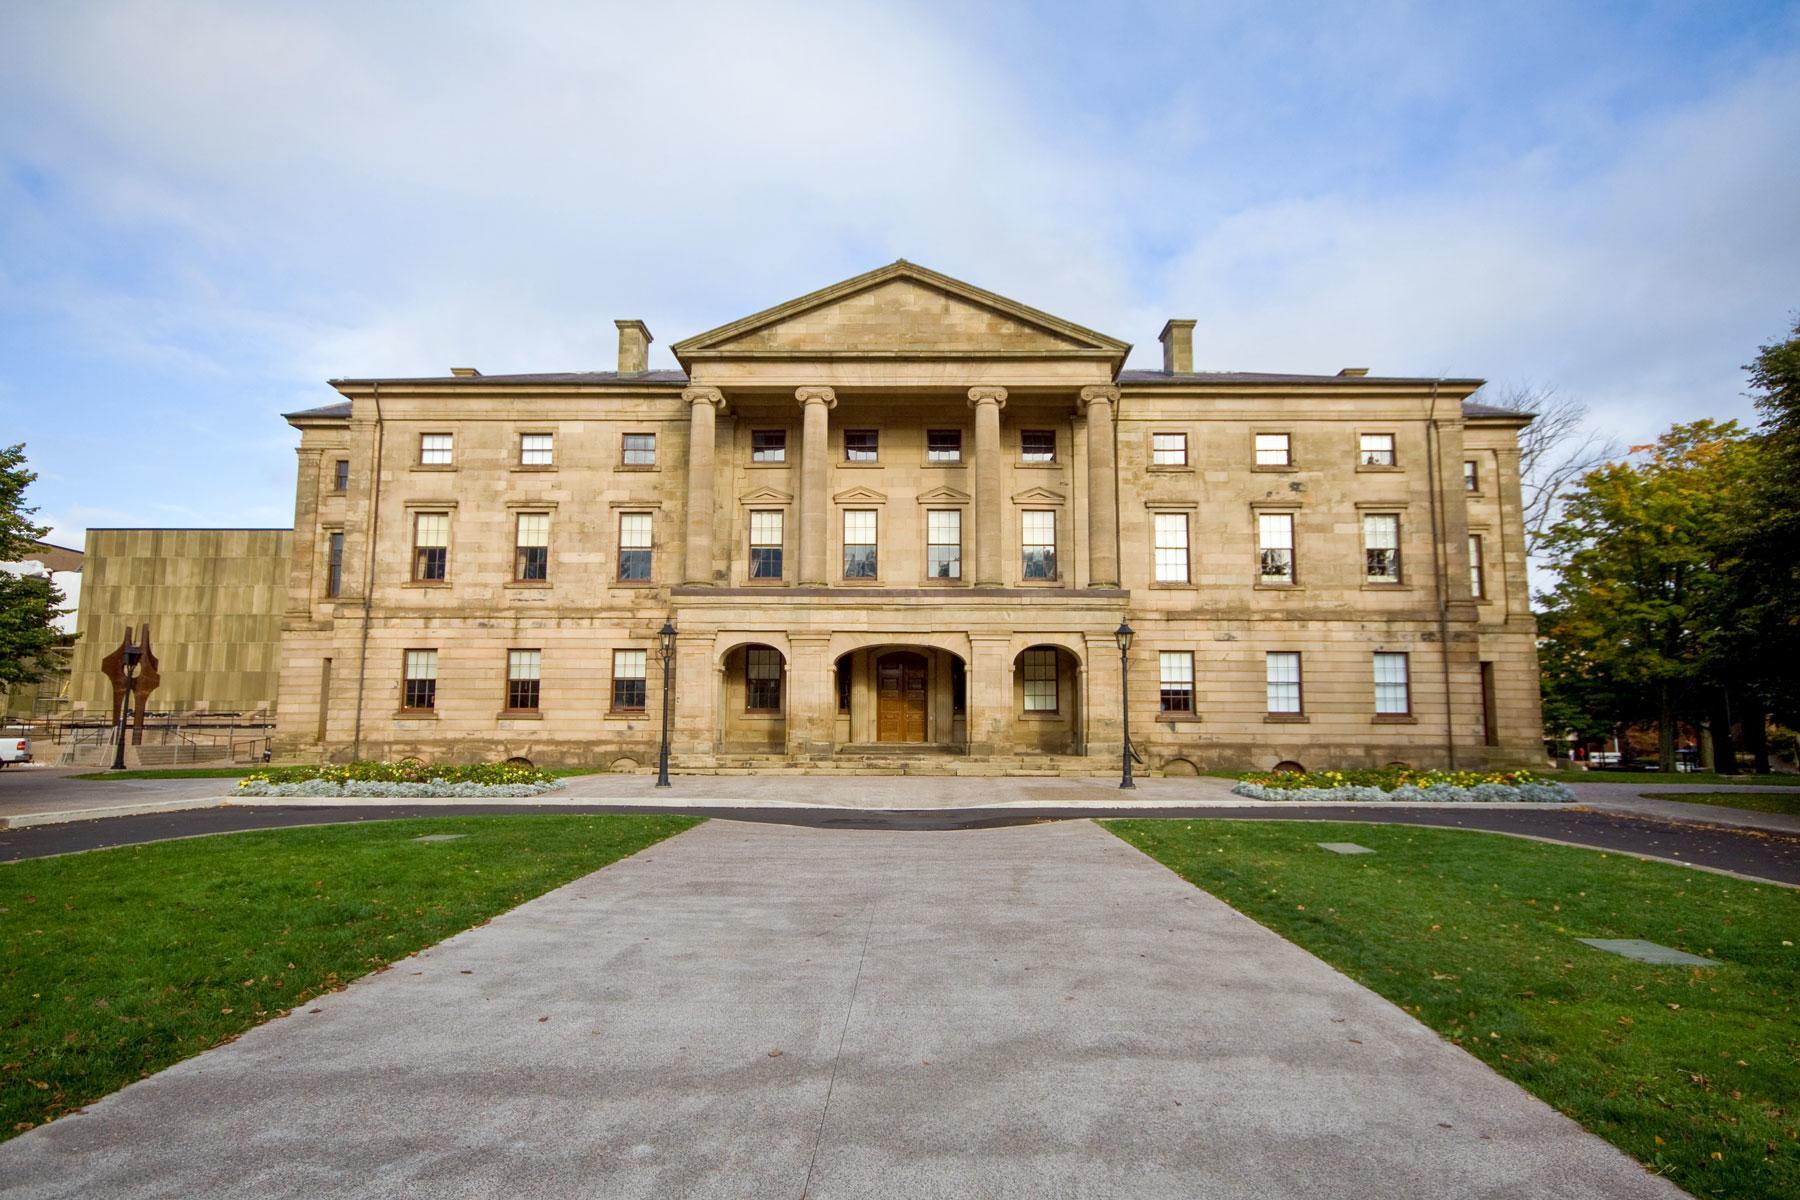 10_Historic_Sites_Atlantic_Canada_Confederation_Place_shutterstock_233463205